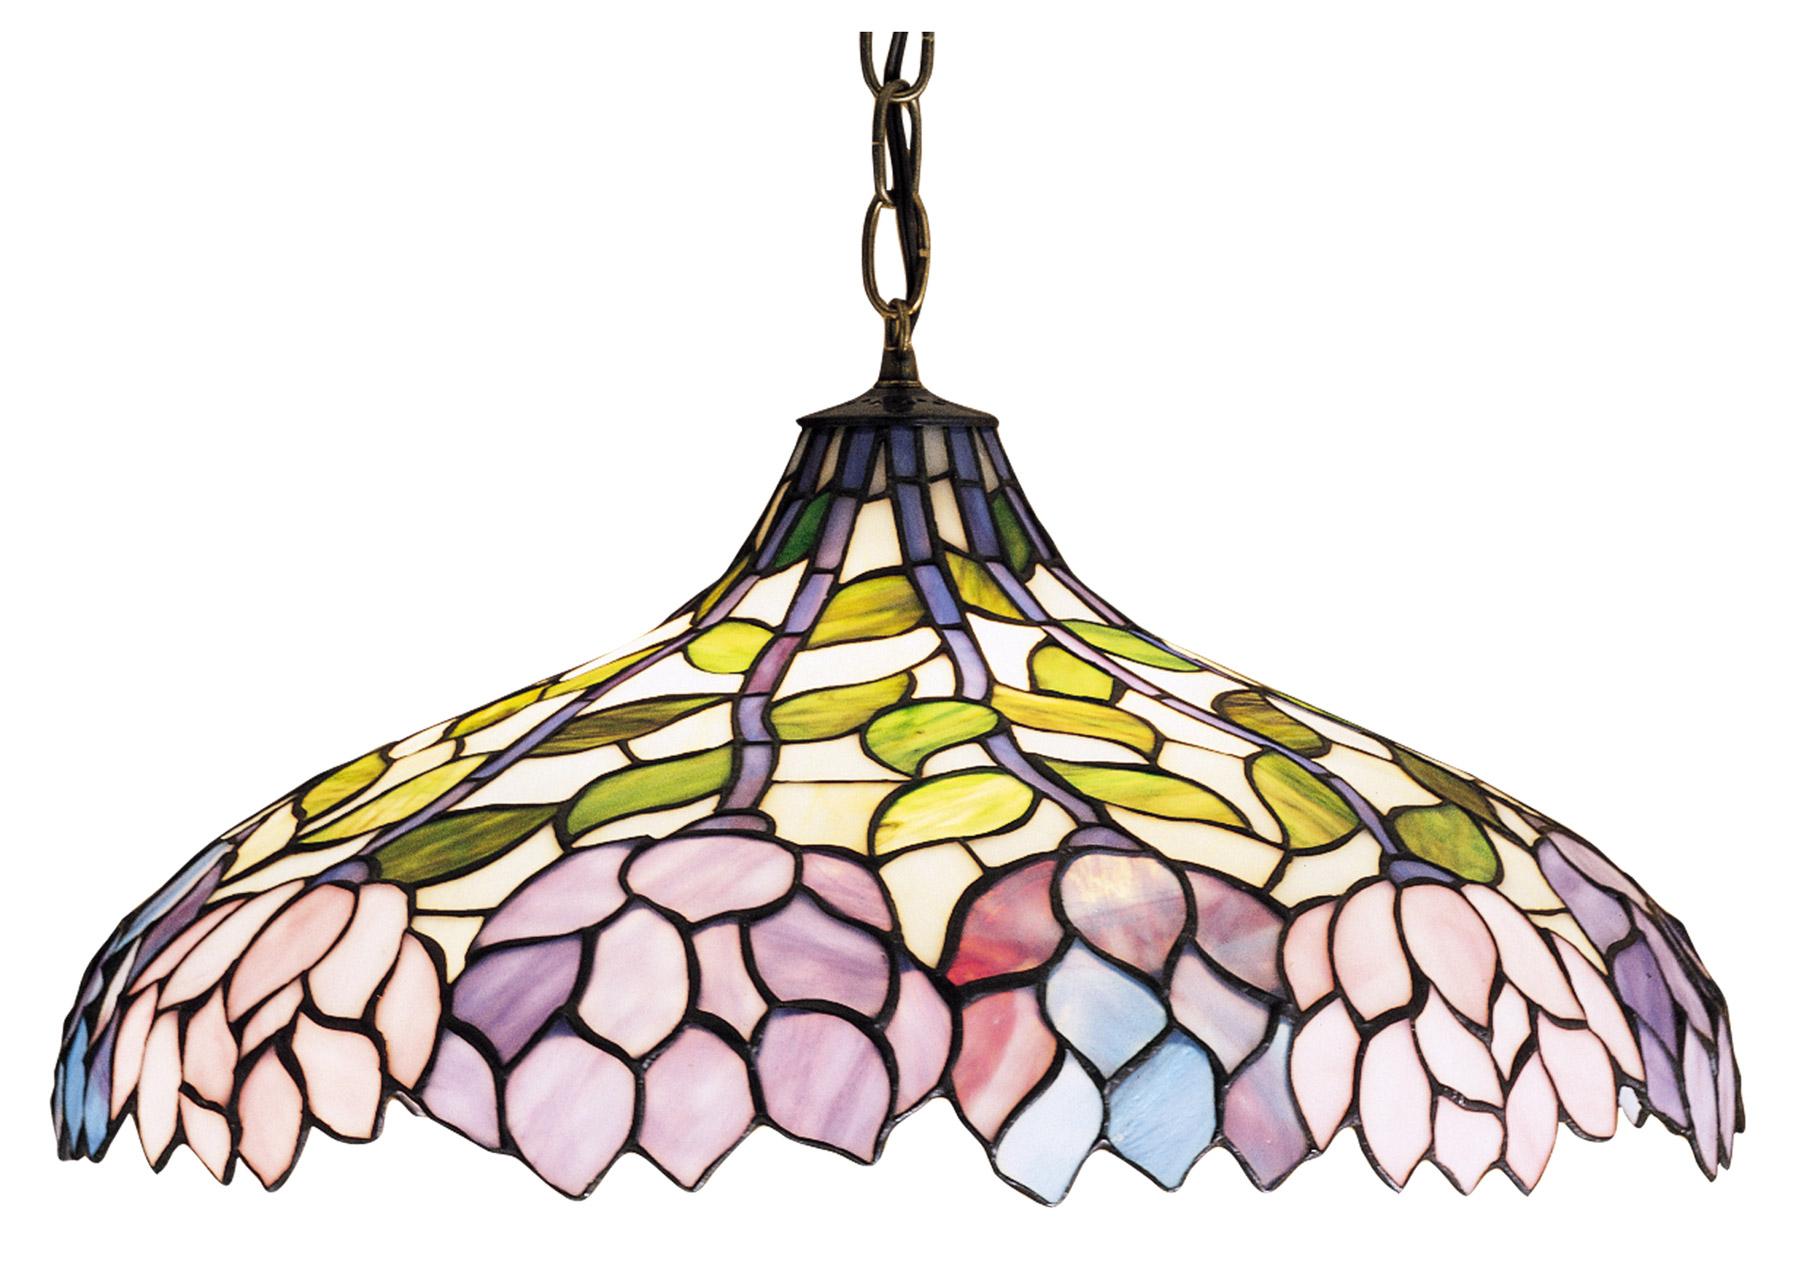 Meyda 30449 Tiffany Classic Wisteria Hanging Lamp